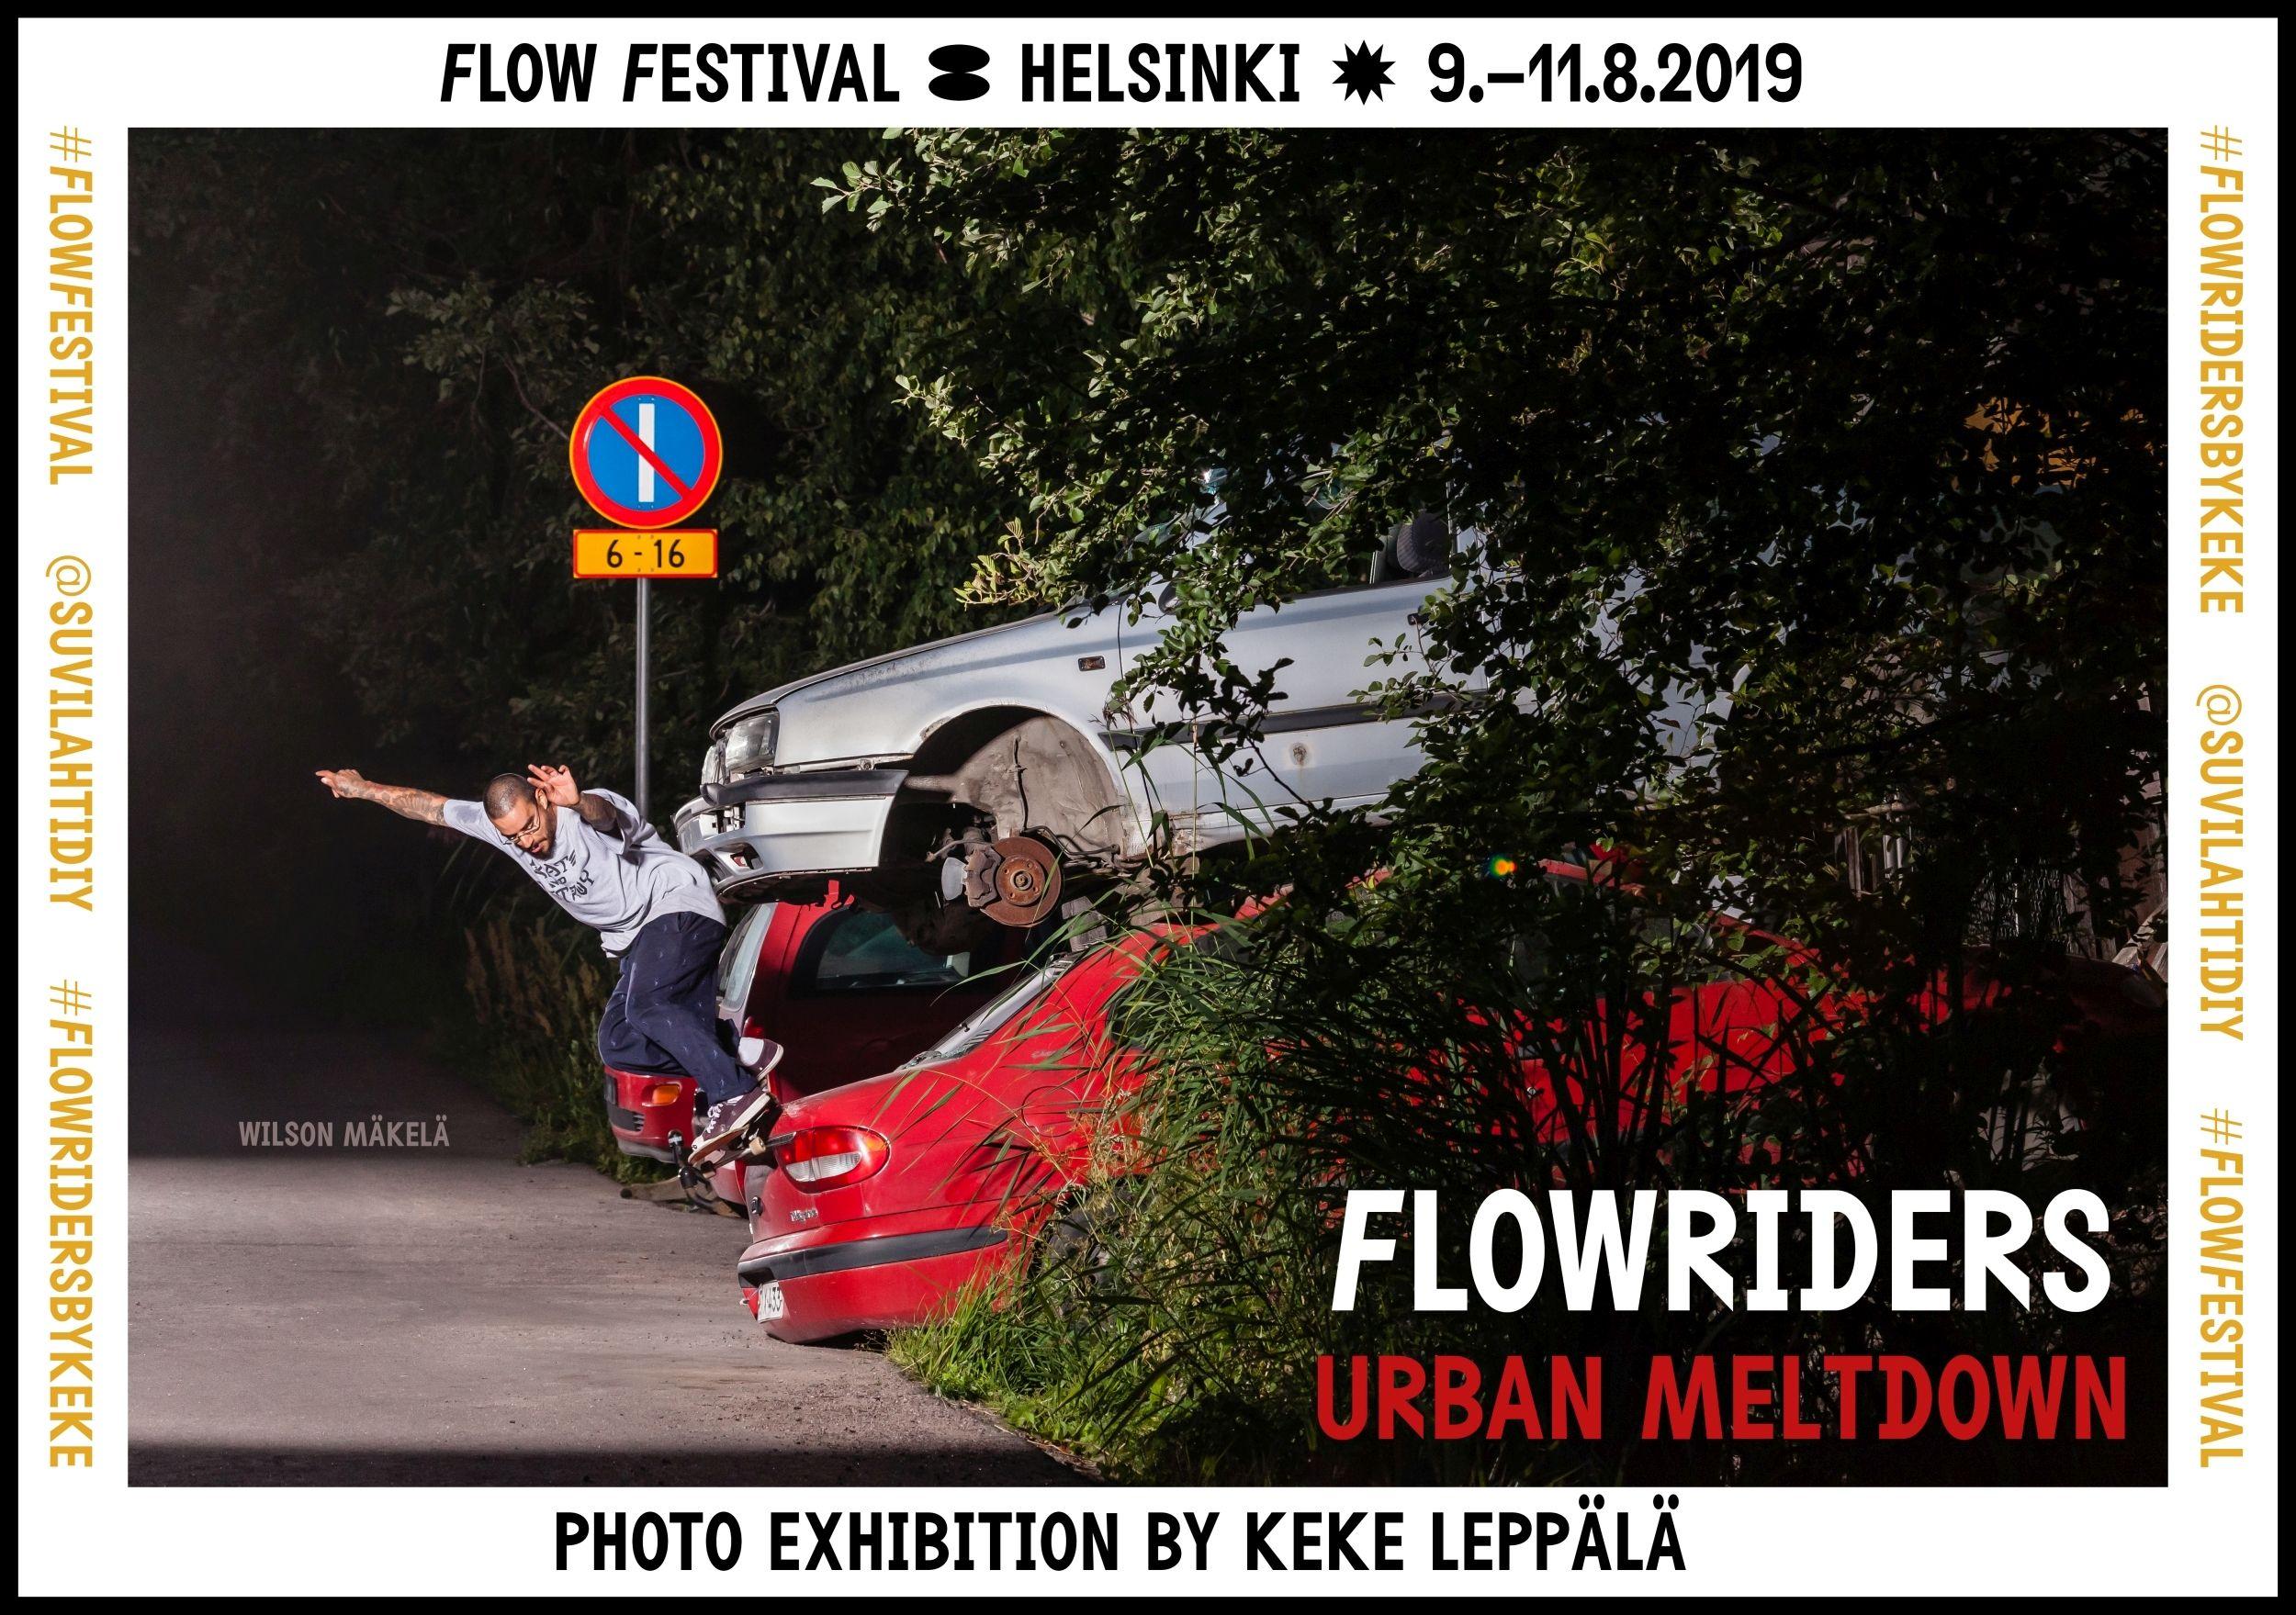 flowriders-urban meltdown flyer2 - Wilson Makela -  2019 kekeleppala.jpg